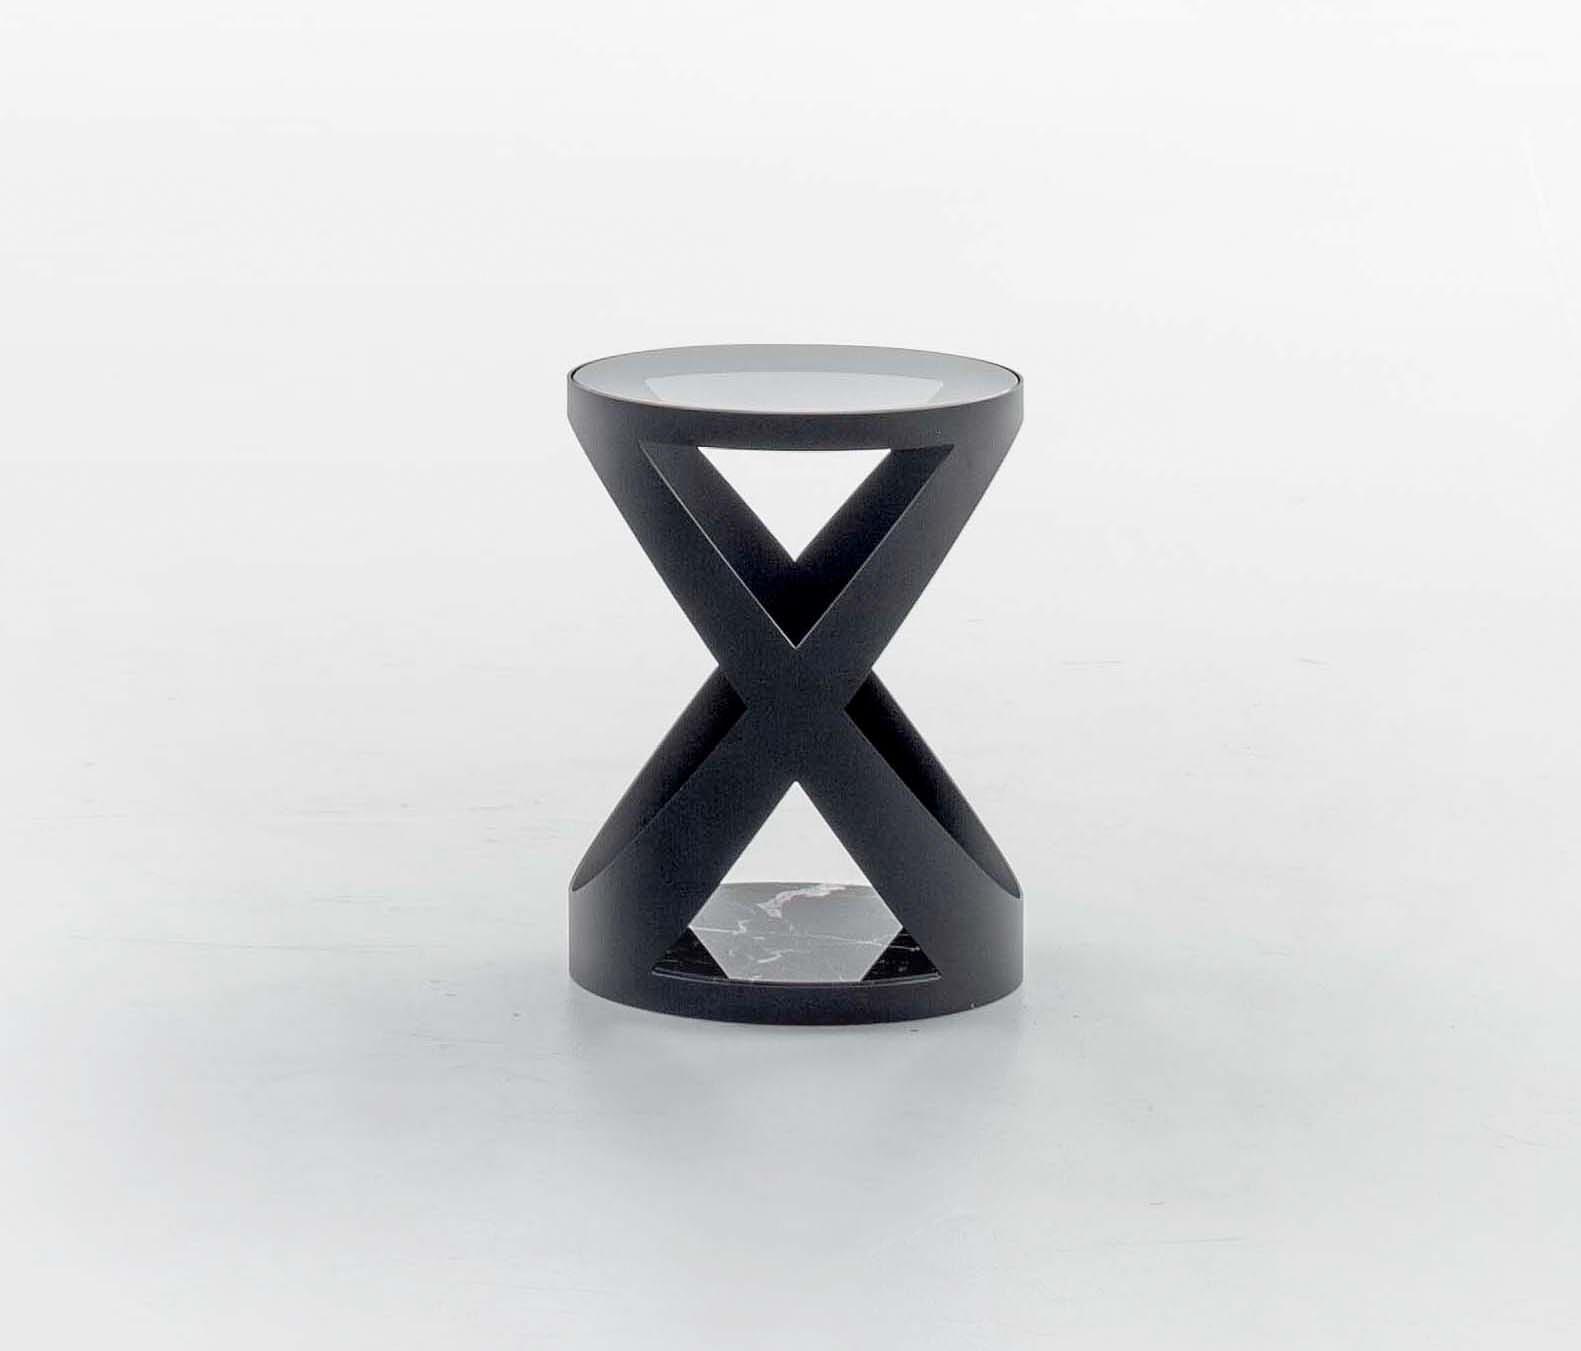 RIMINI - Beistelltische von Tonin Casa | Architonic